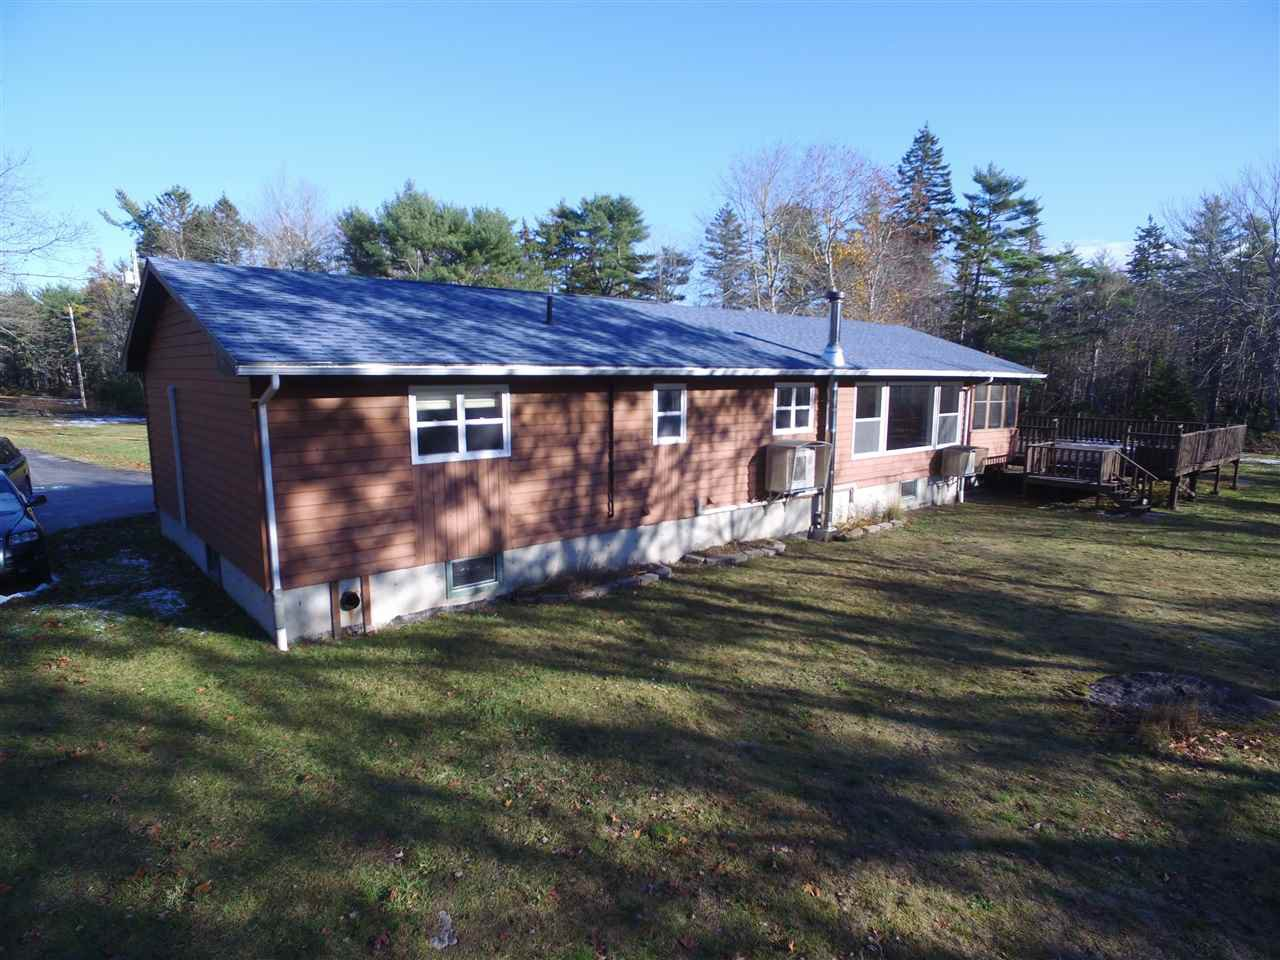 Main Photo: 26 Jackson Lane in Shelburne: 407-Shelburne County Residential for sale (South Shore)  : MLS®# 202023196